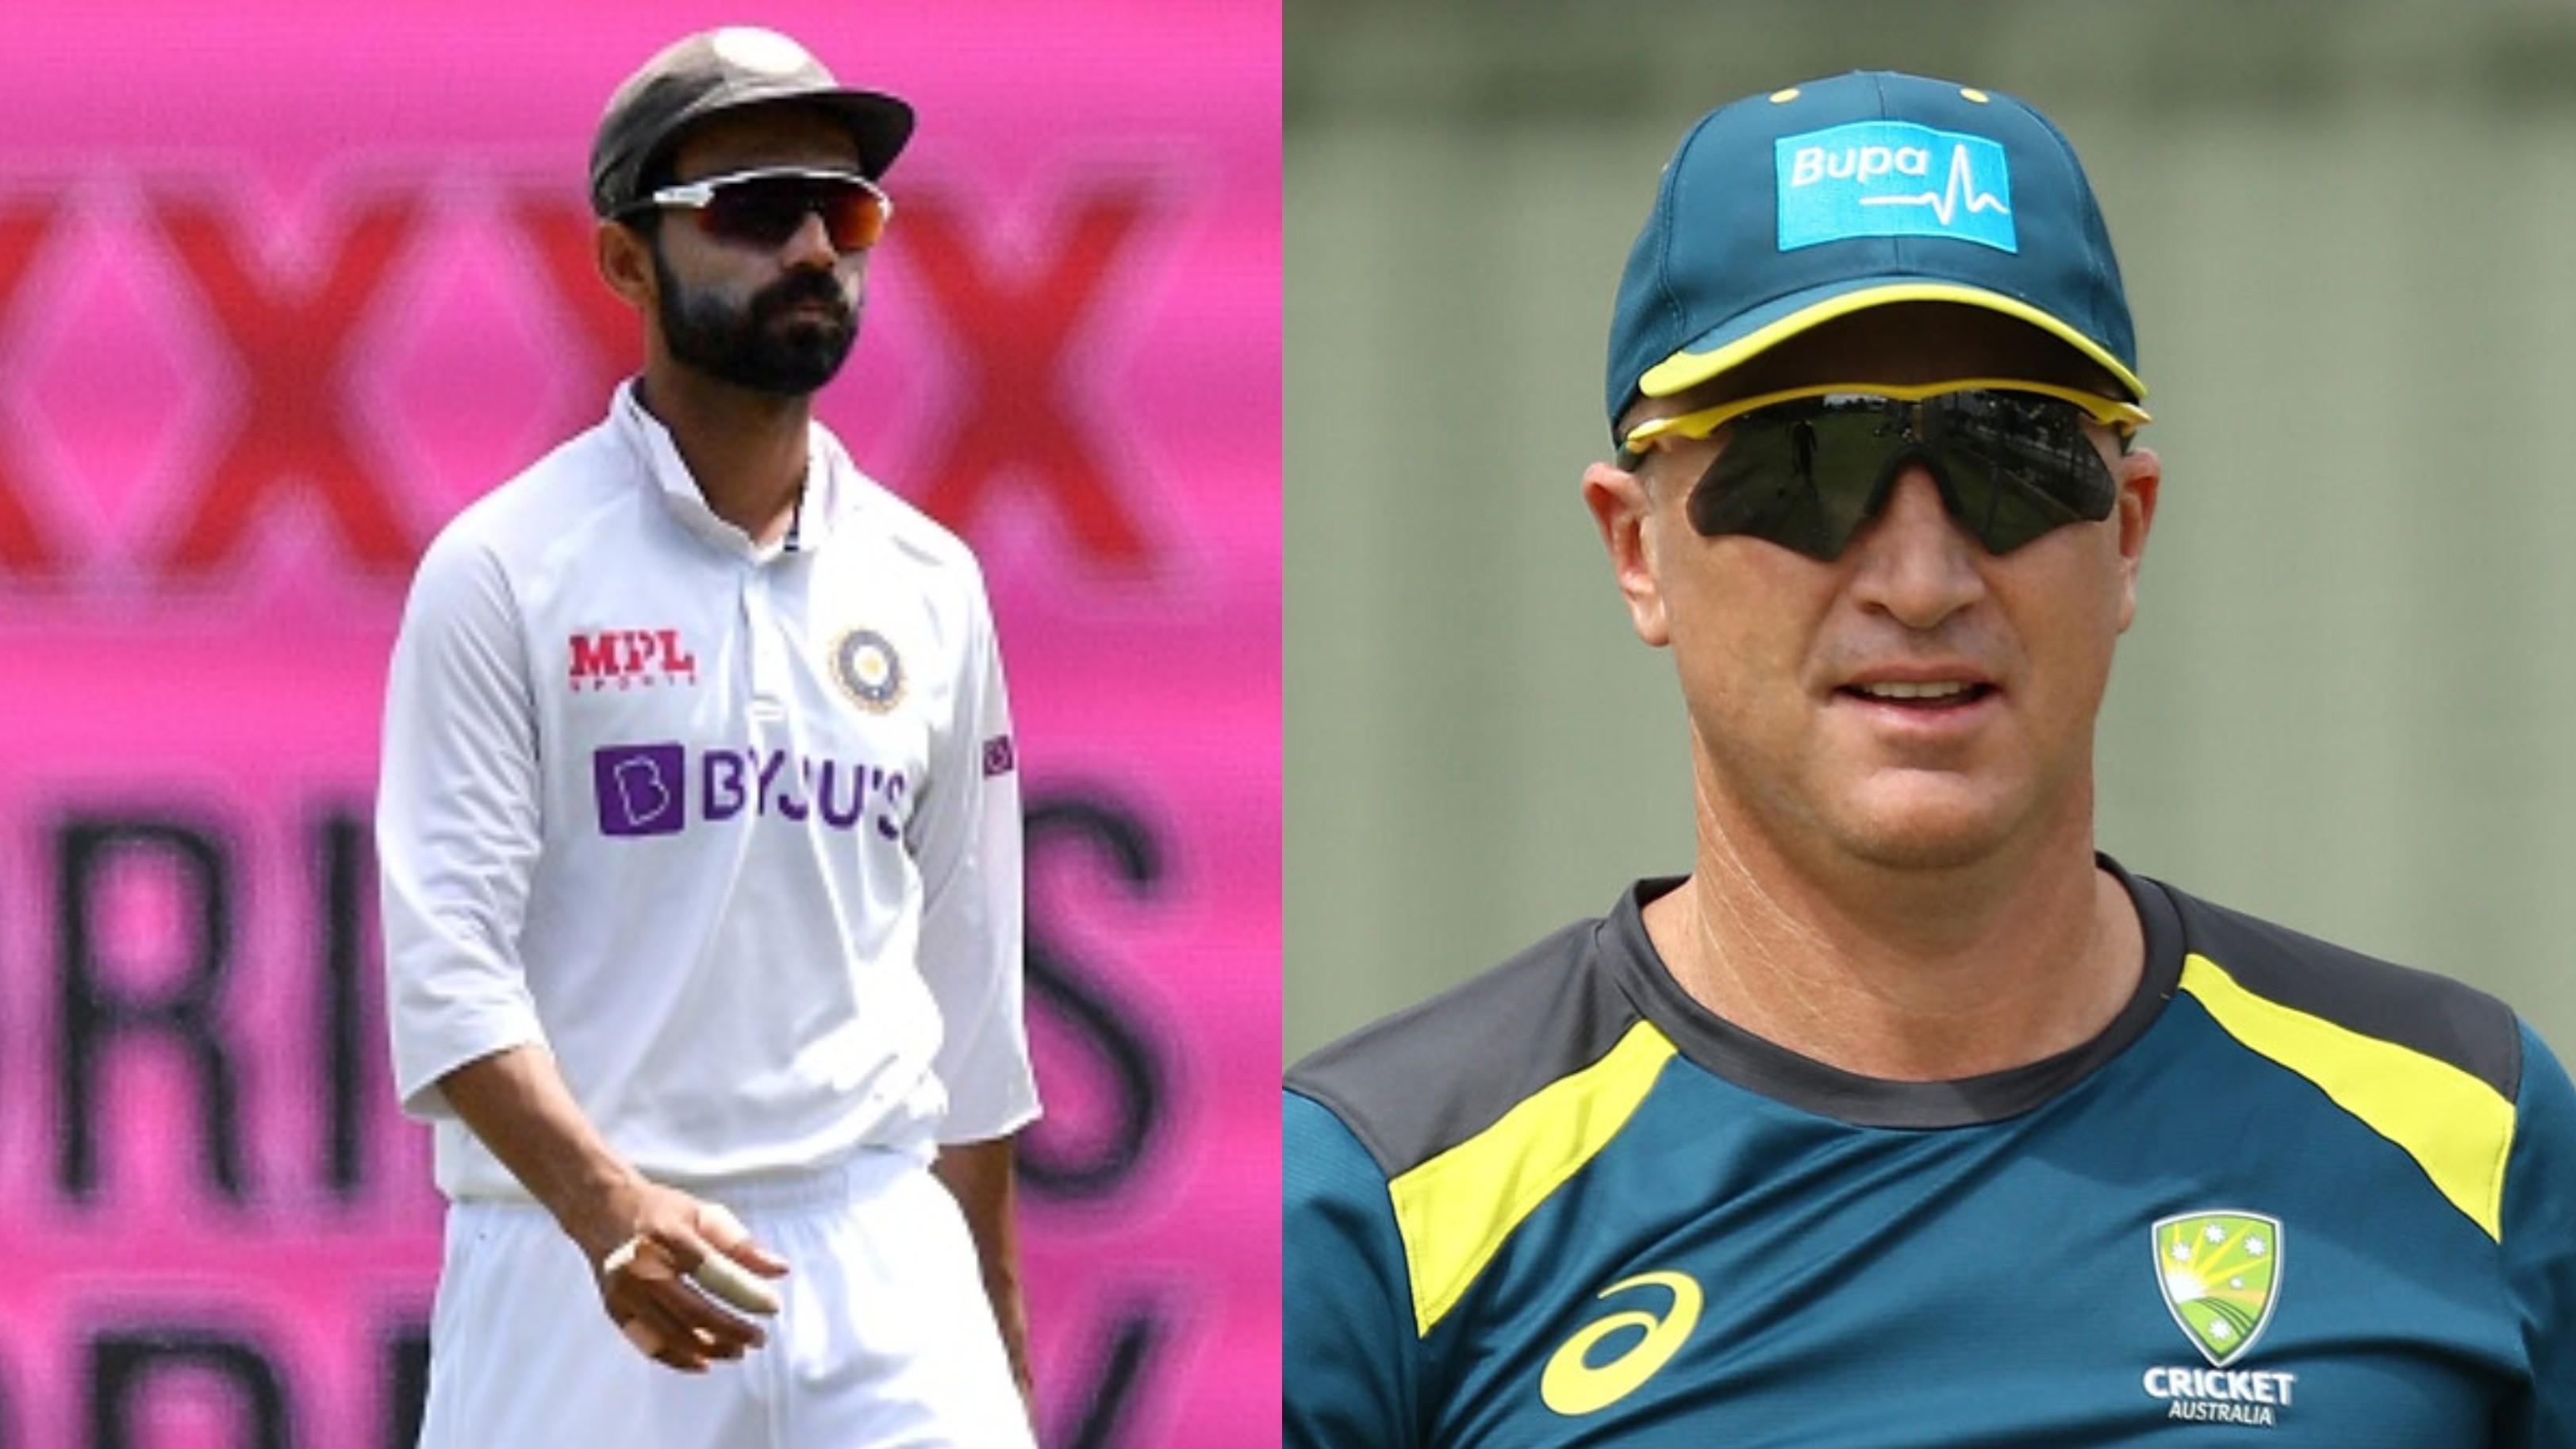 AUS v IND 2020-21: Brad Haddin hails Ajinkya Rahane's outstanding captaincy in Sydney Test